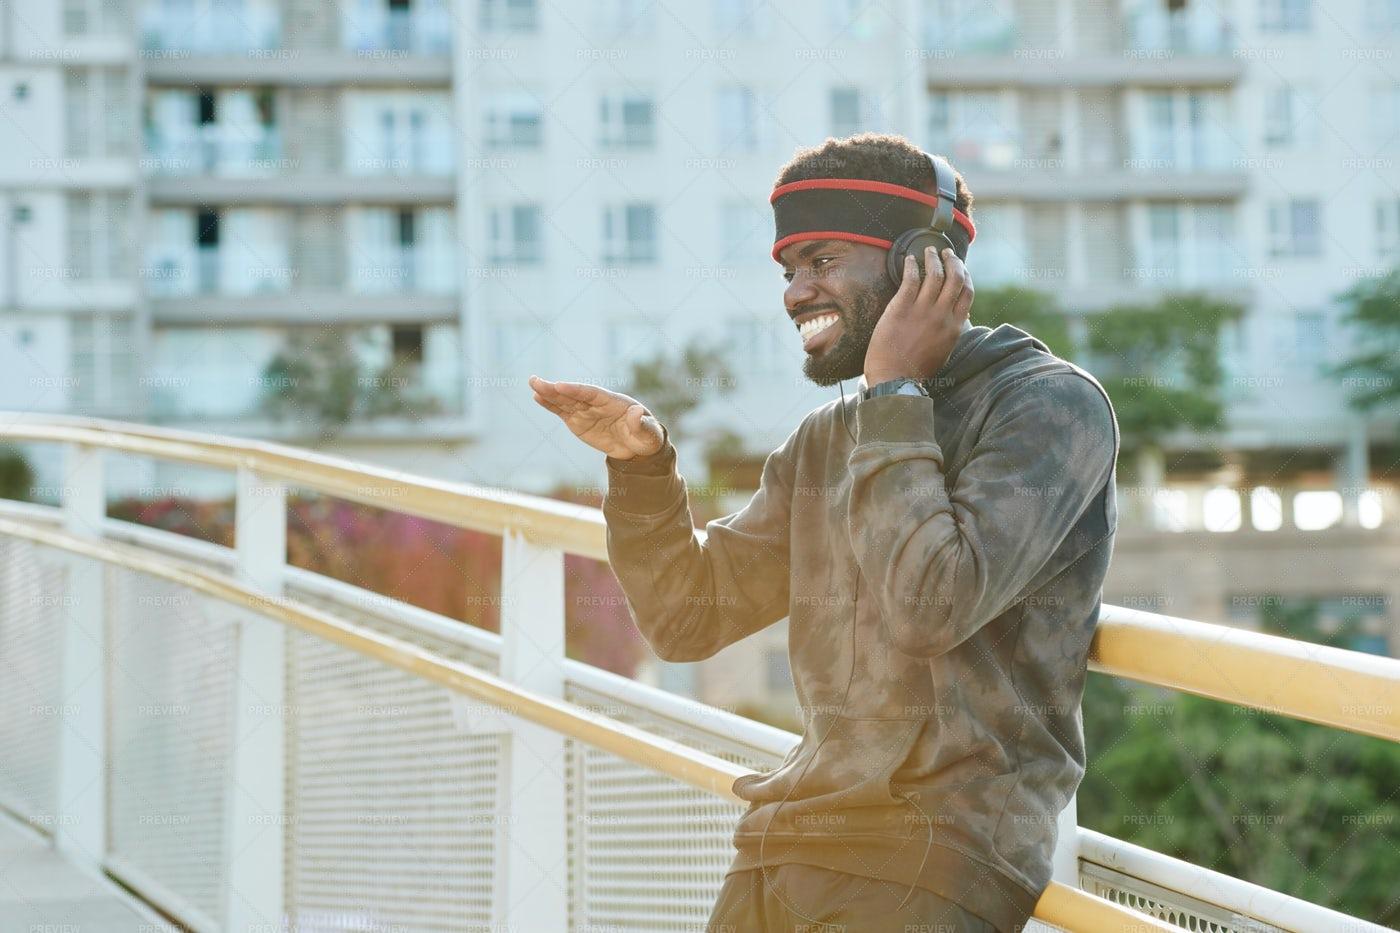 Man Dancing To The Music In Headphones: Stock Photos